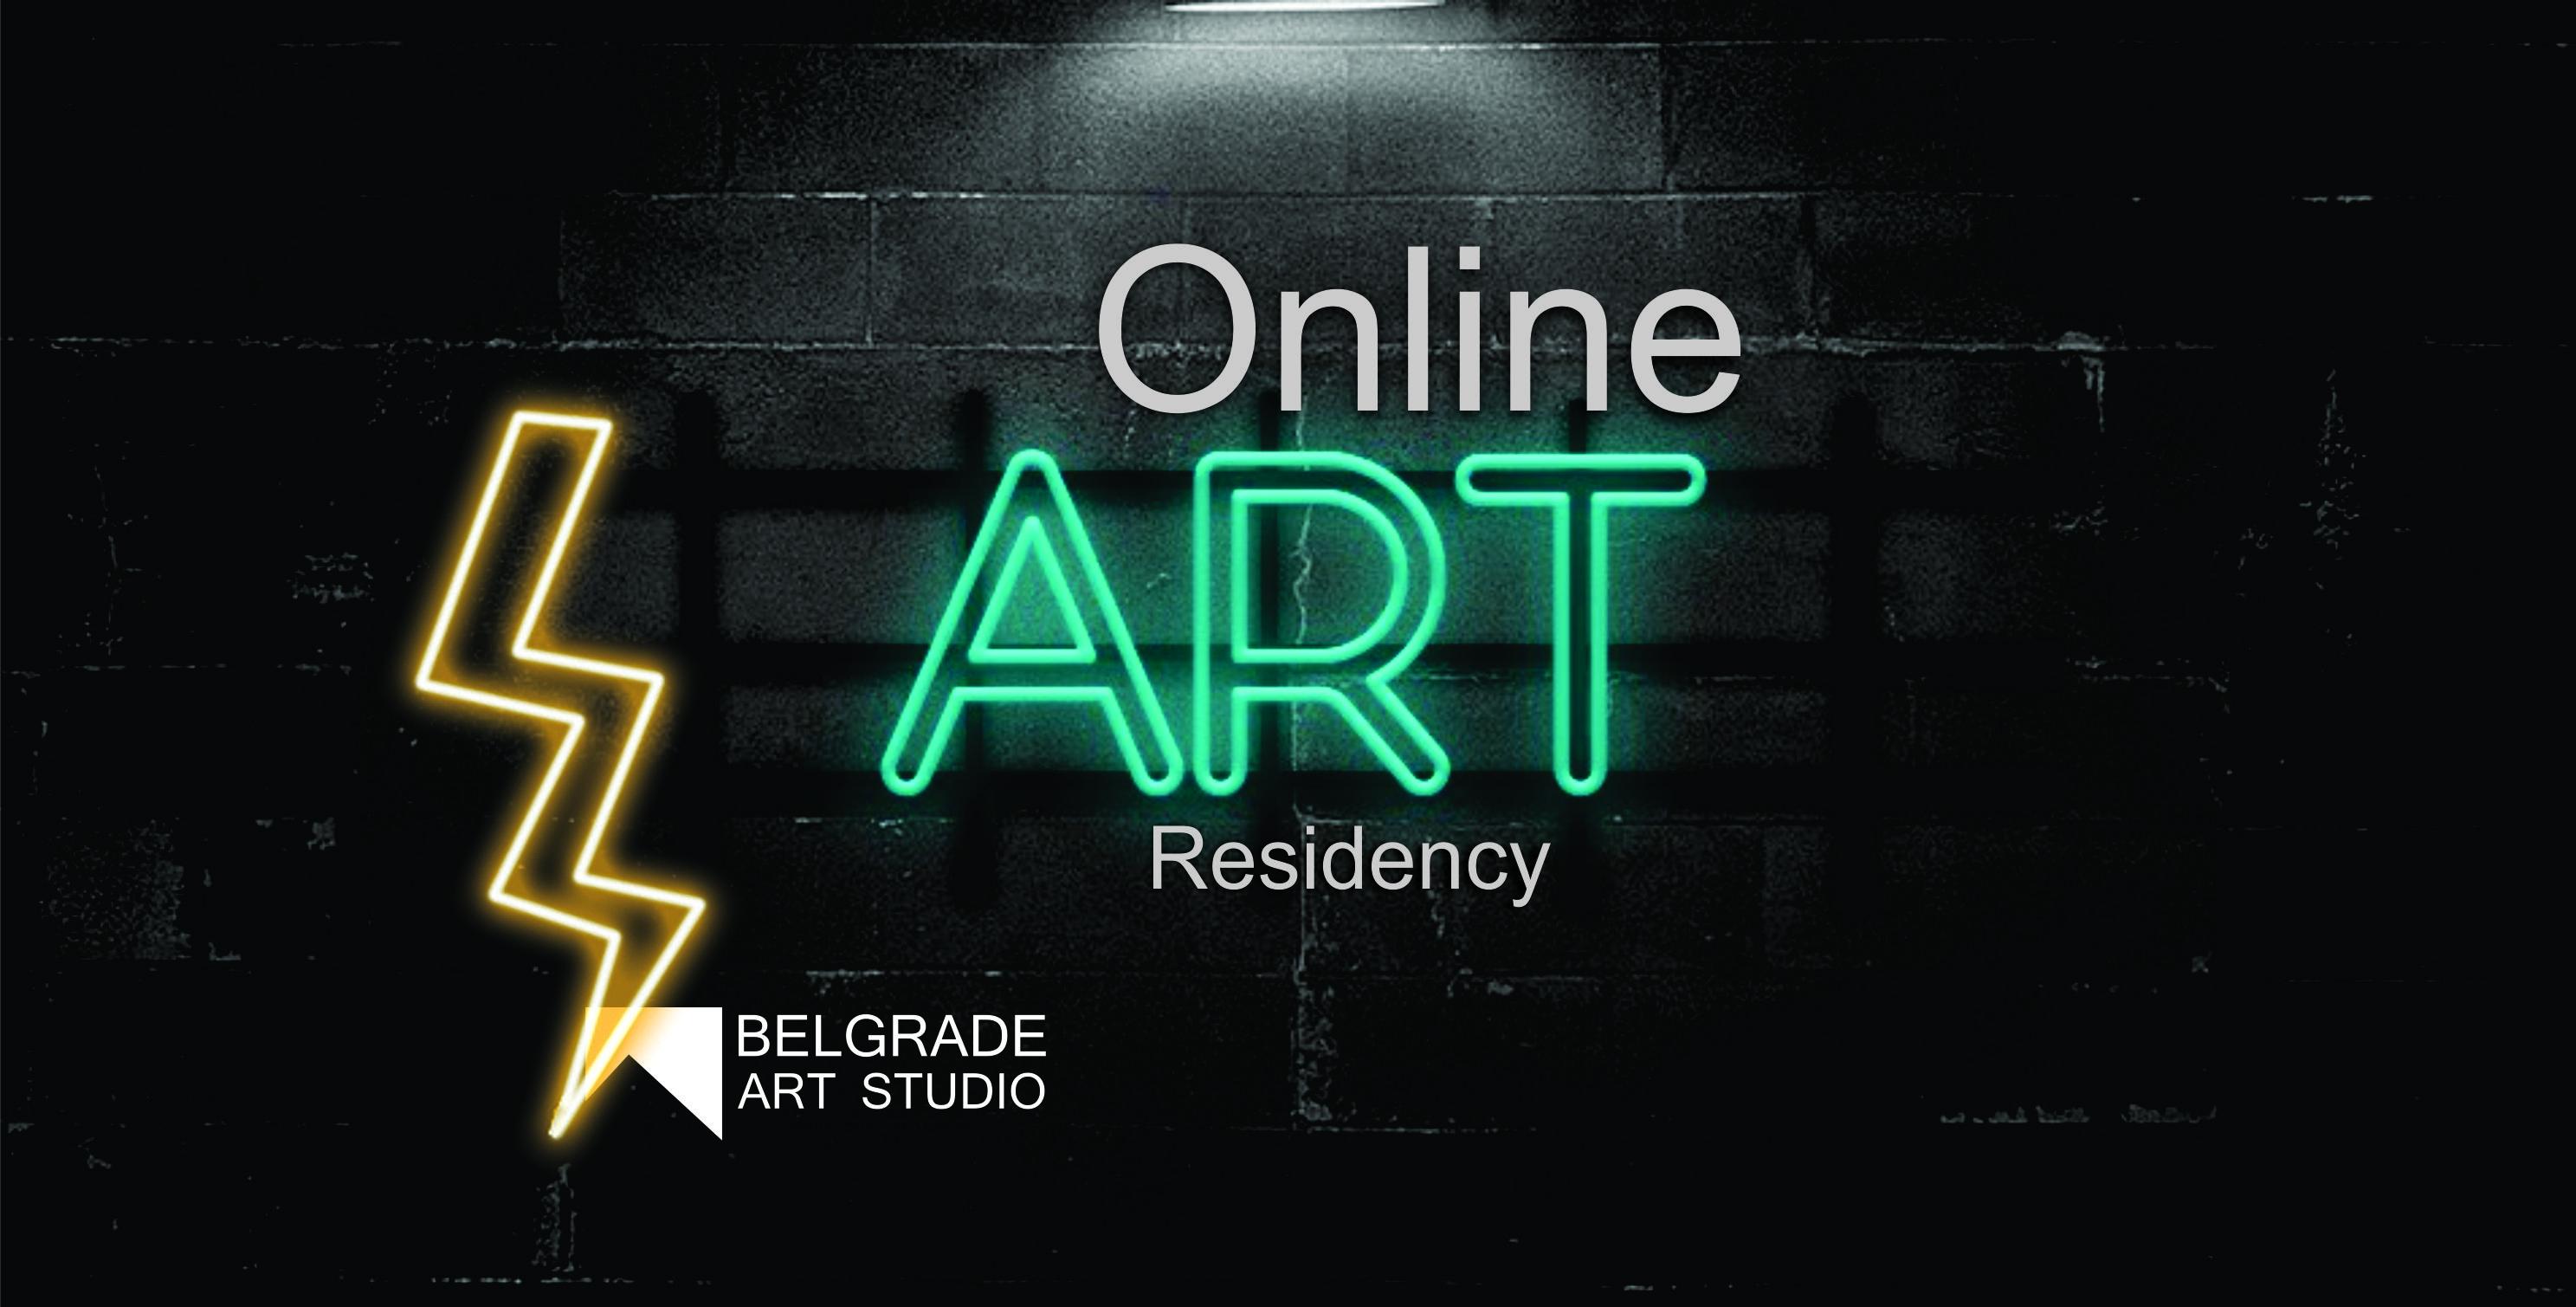 belgrade online residency